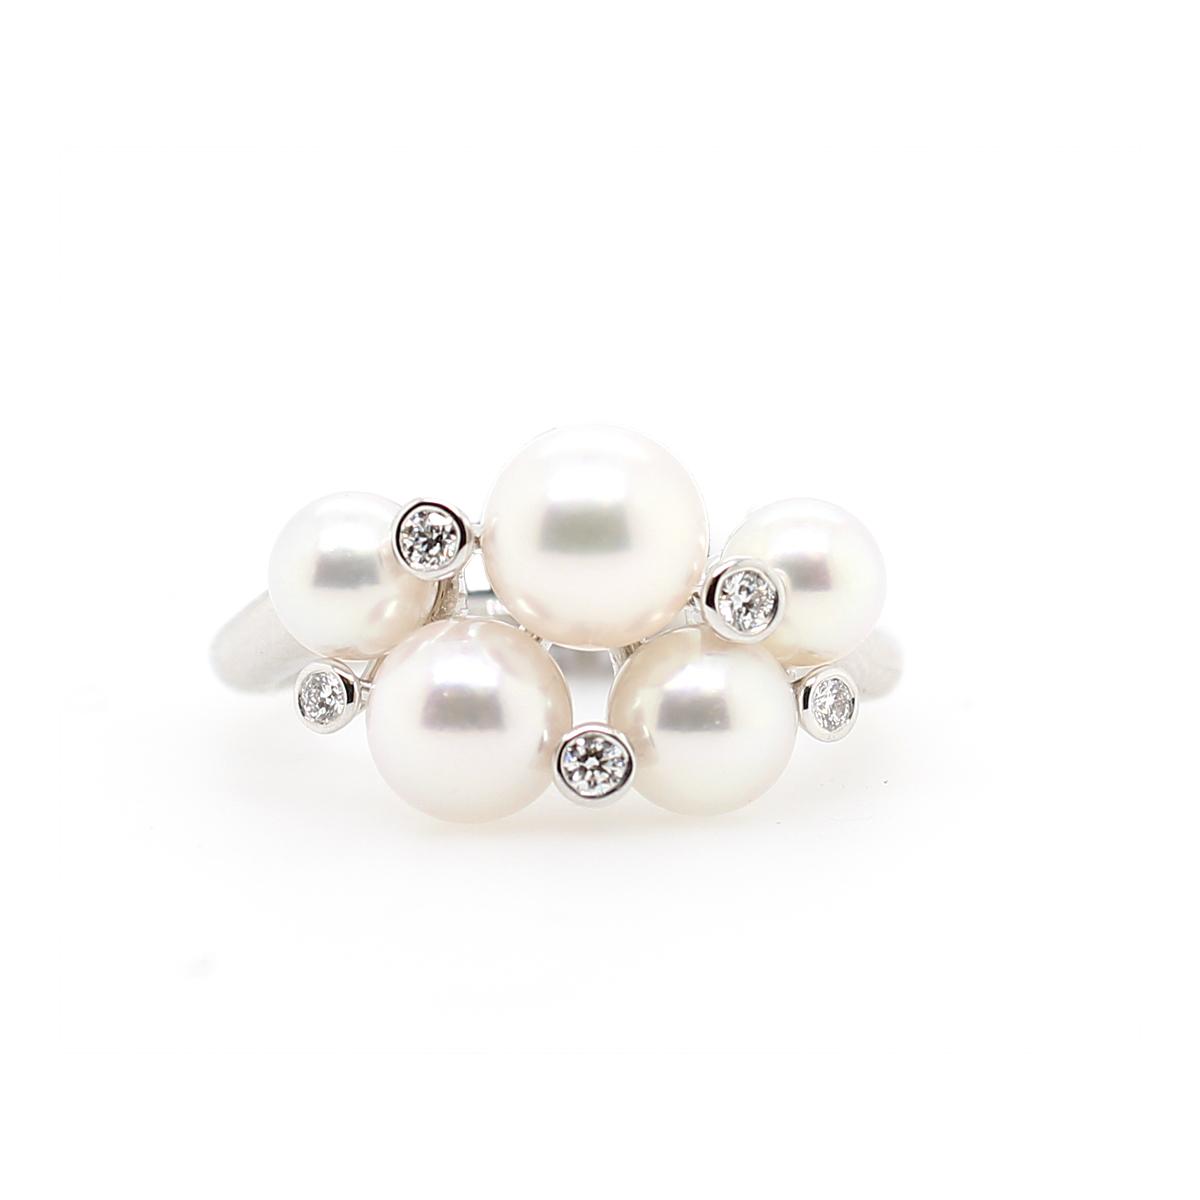 Mikimoto 18 Karat White Gold Pearl and Diamond Cluster Ring